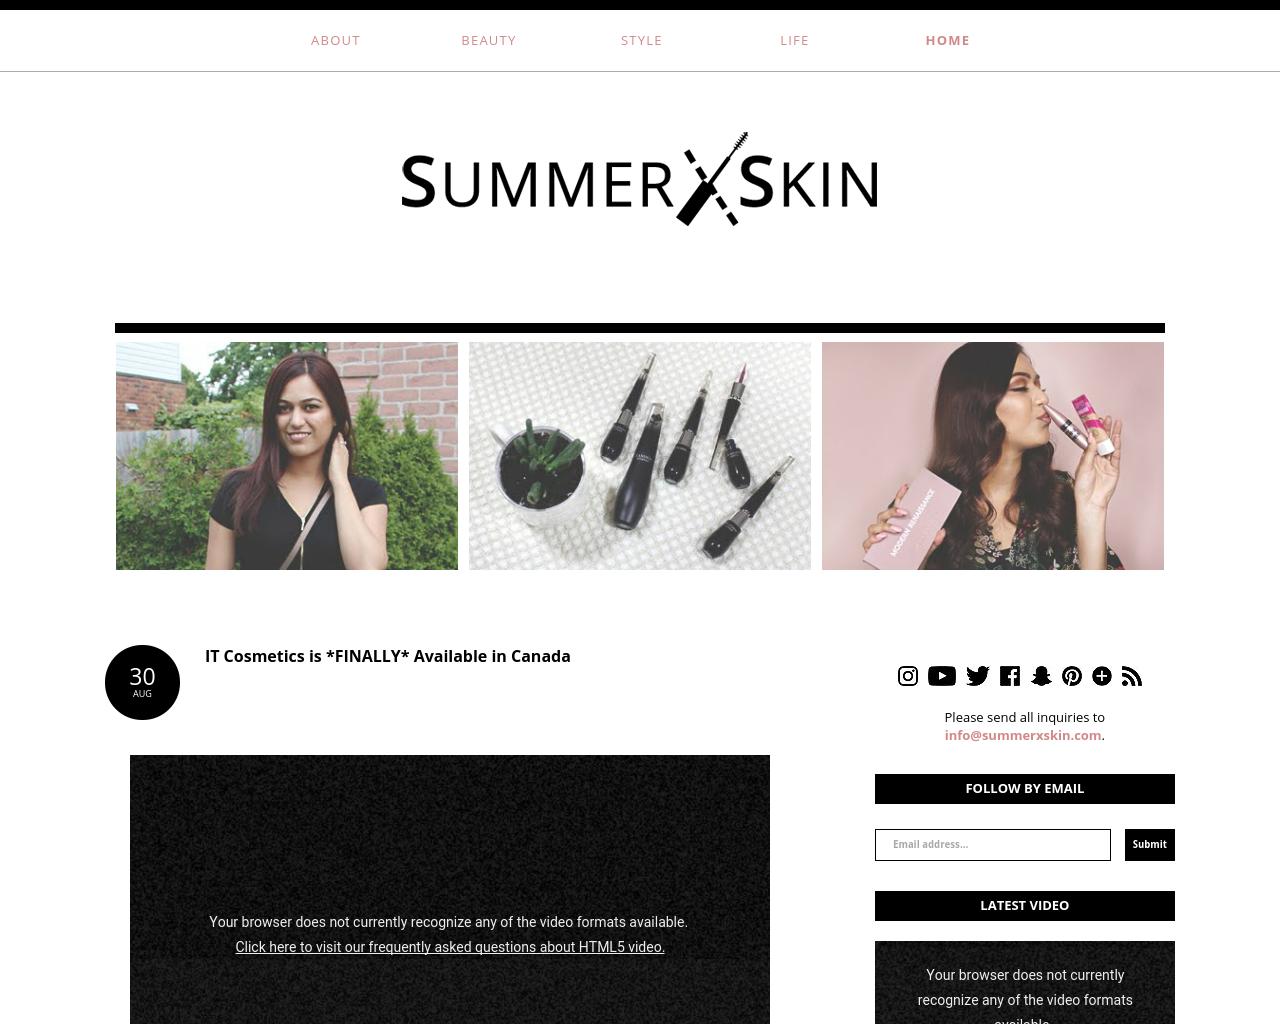 SUMMERxSKIN-Advertising-Reviews-Pricing